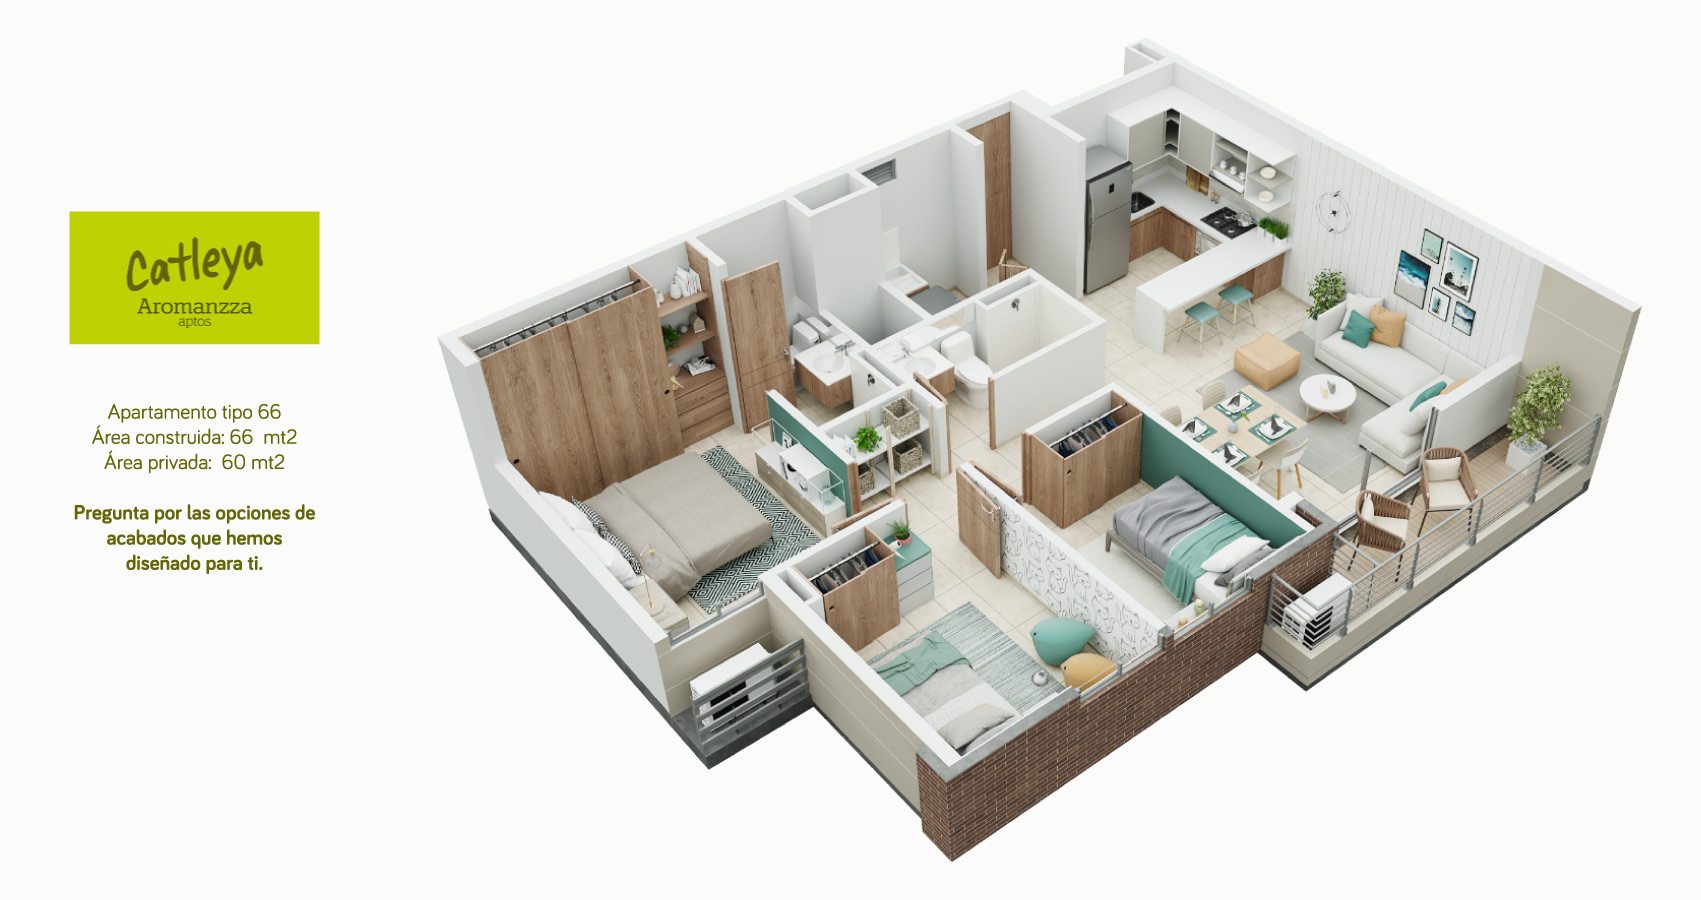 Apartamento tipo 66 Catleya - Aromanza